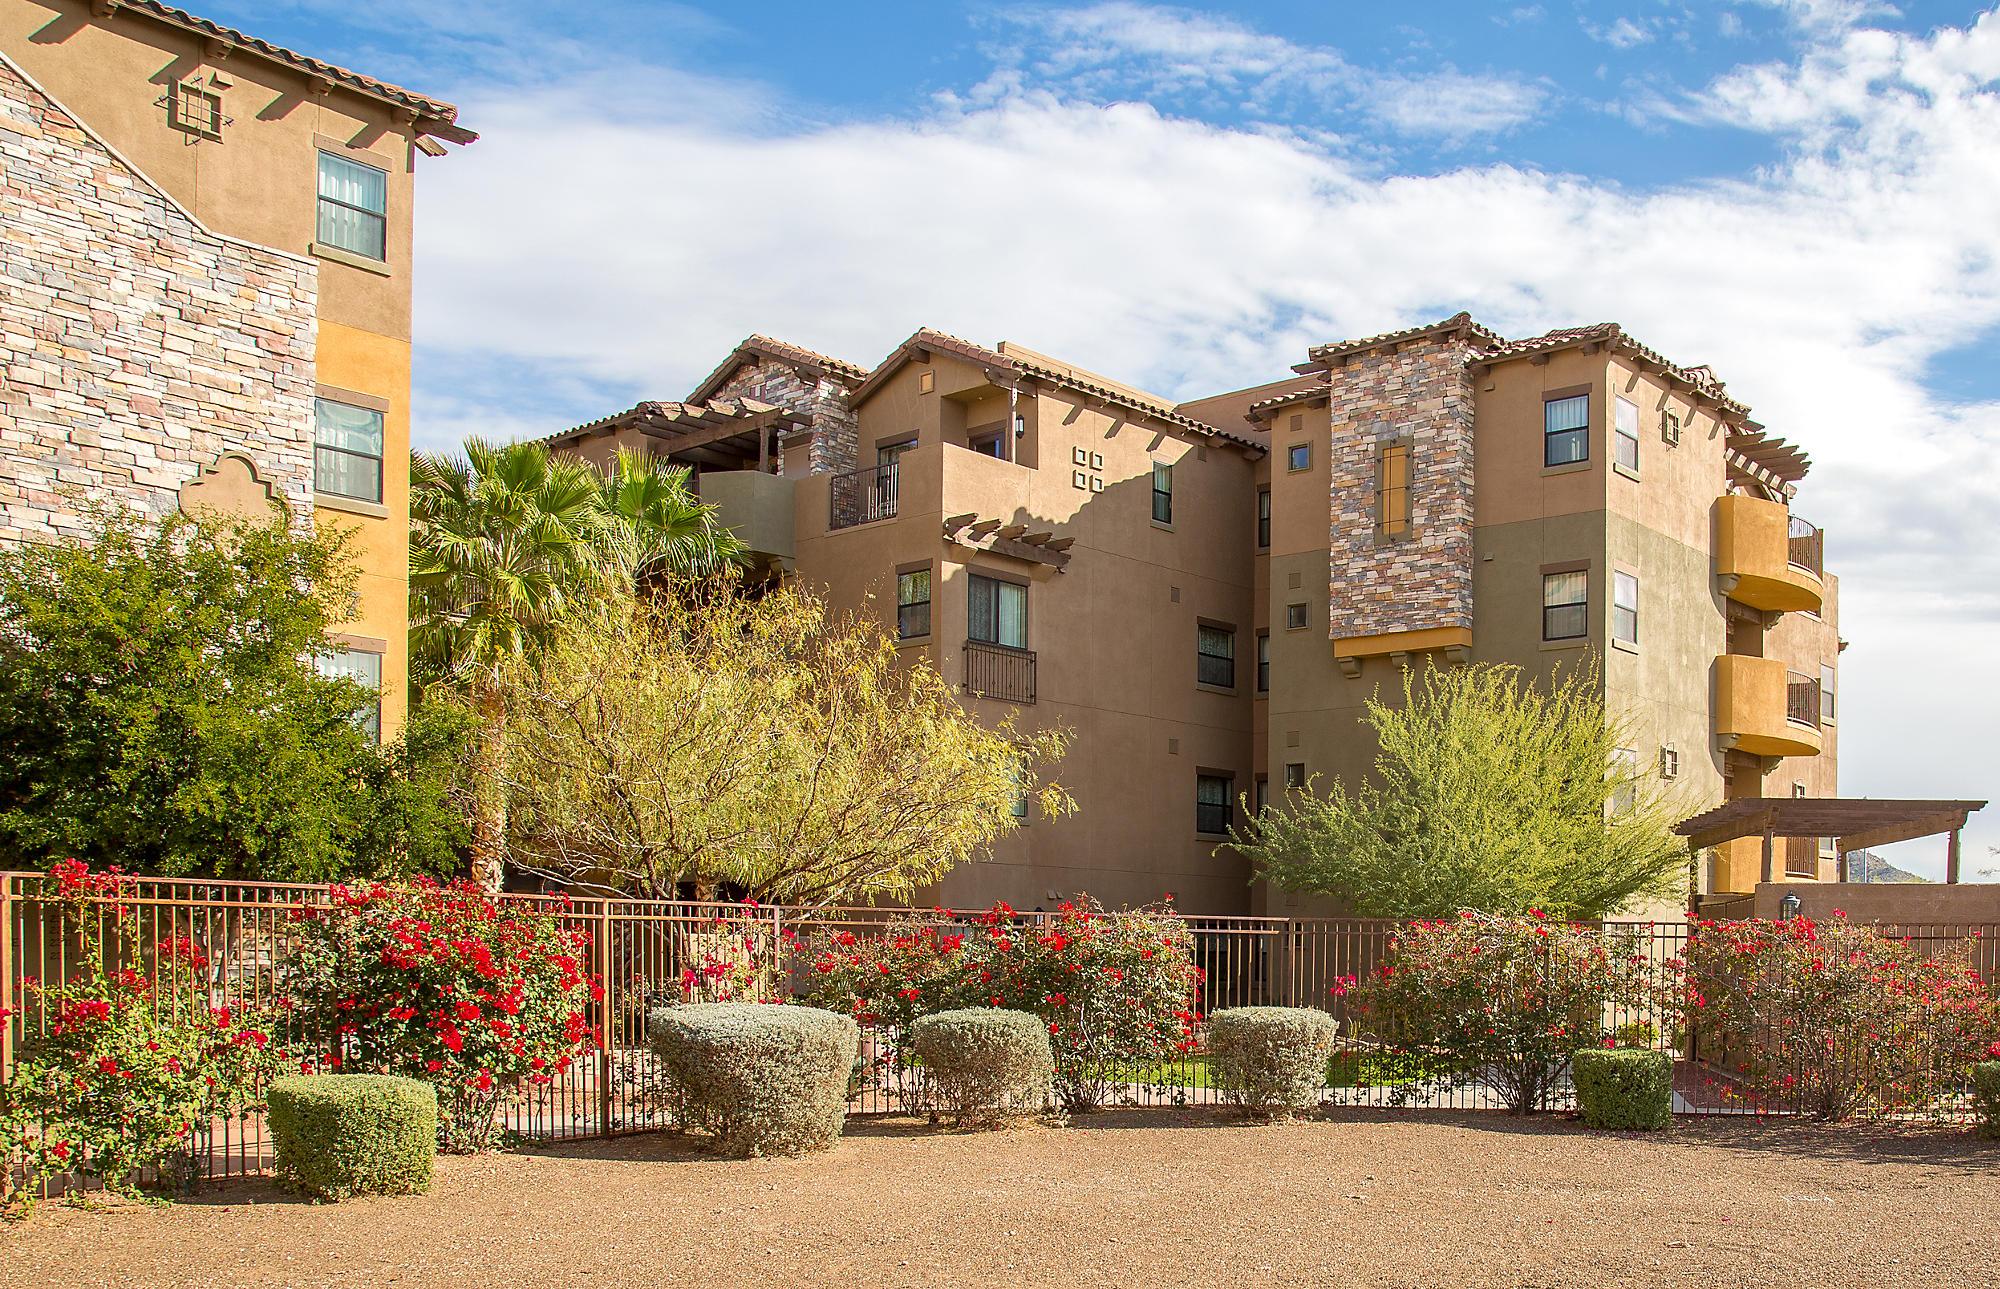 Cibola Vista Resort and Spa  Peoria Arizona  Bluegreen